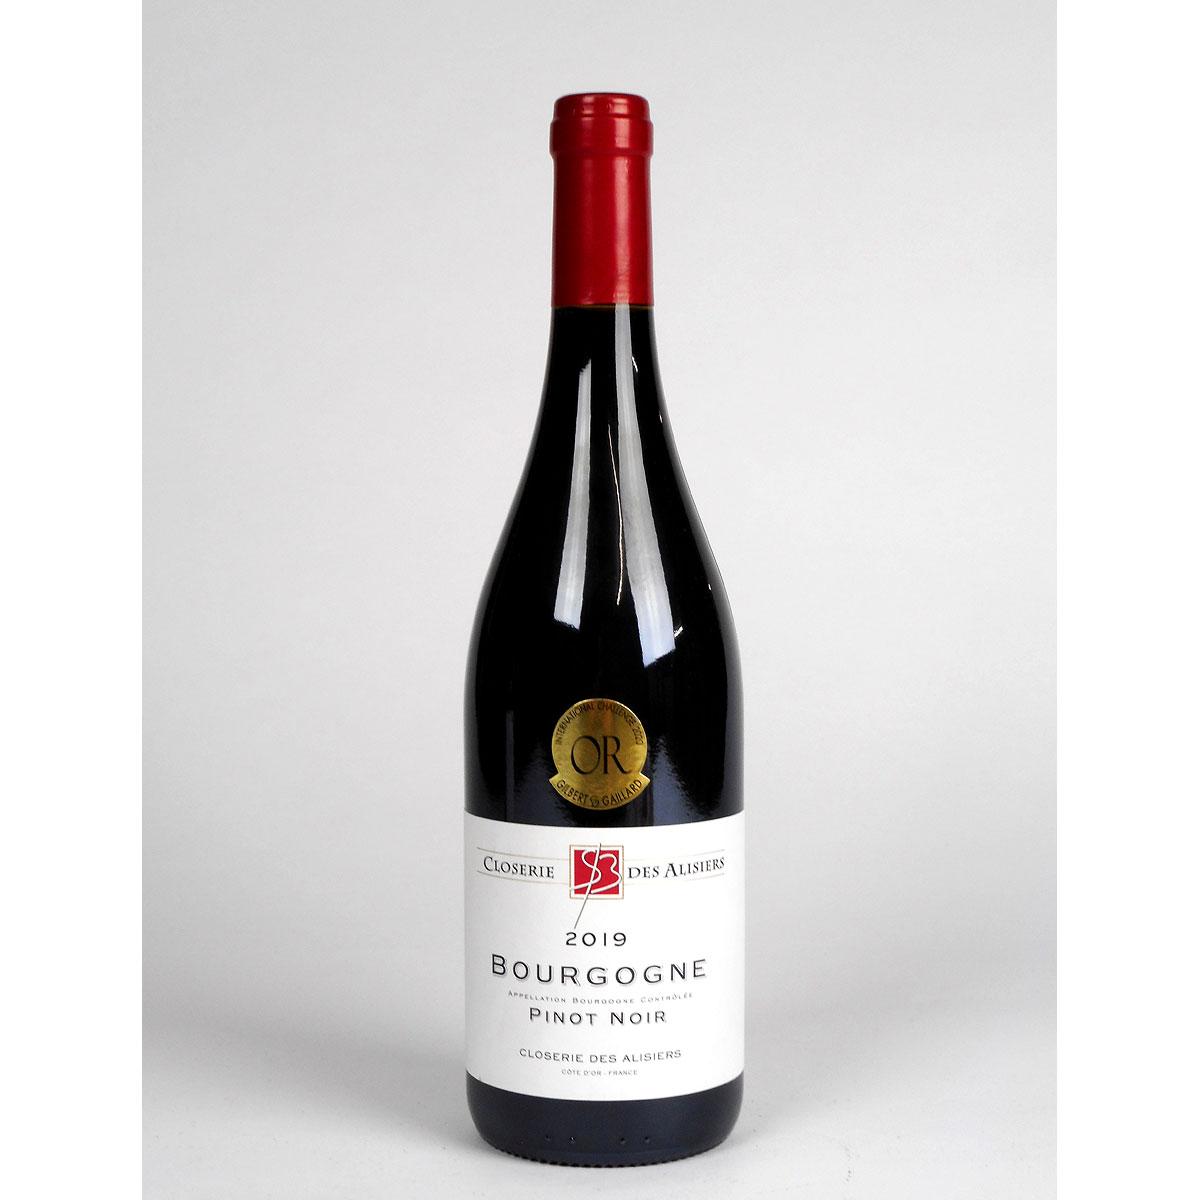 Bourgogne Pinot Noir: Closerie des Alisiers 2019 - Bottle